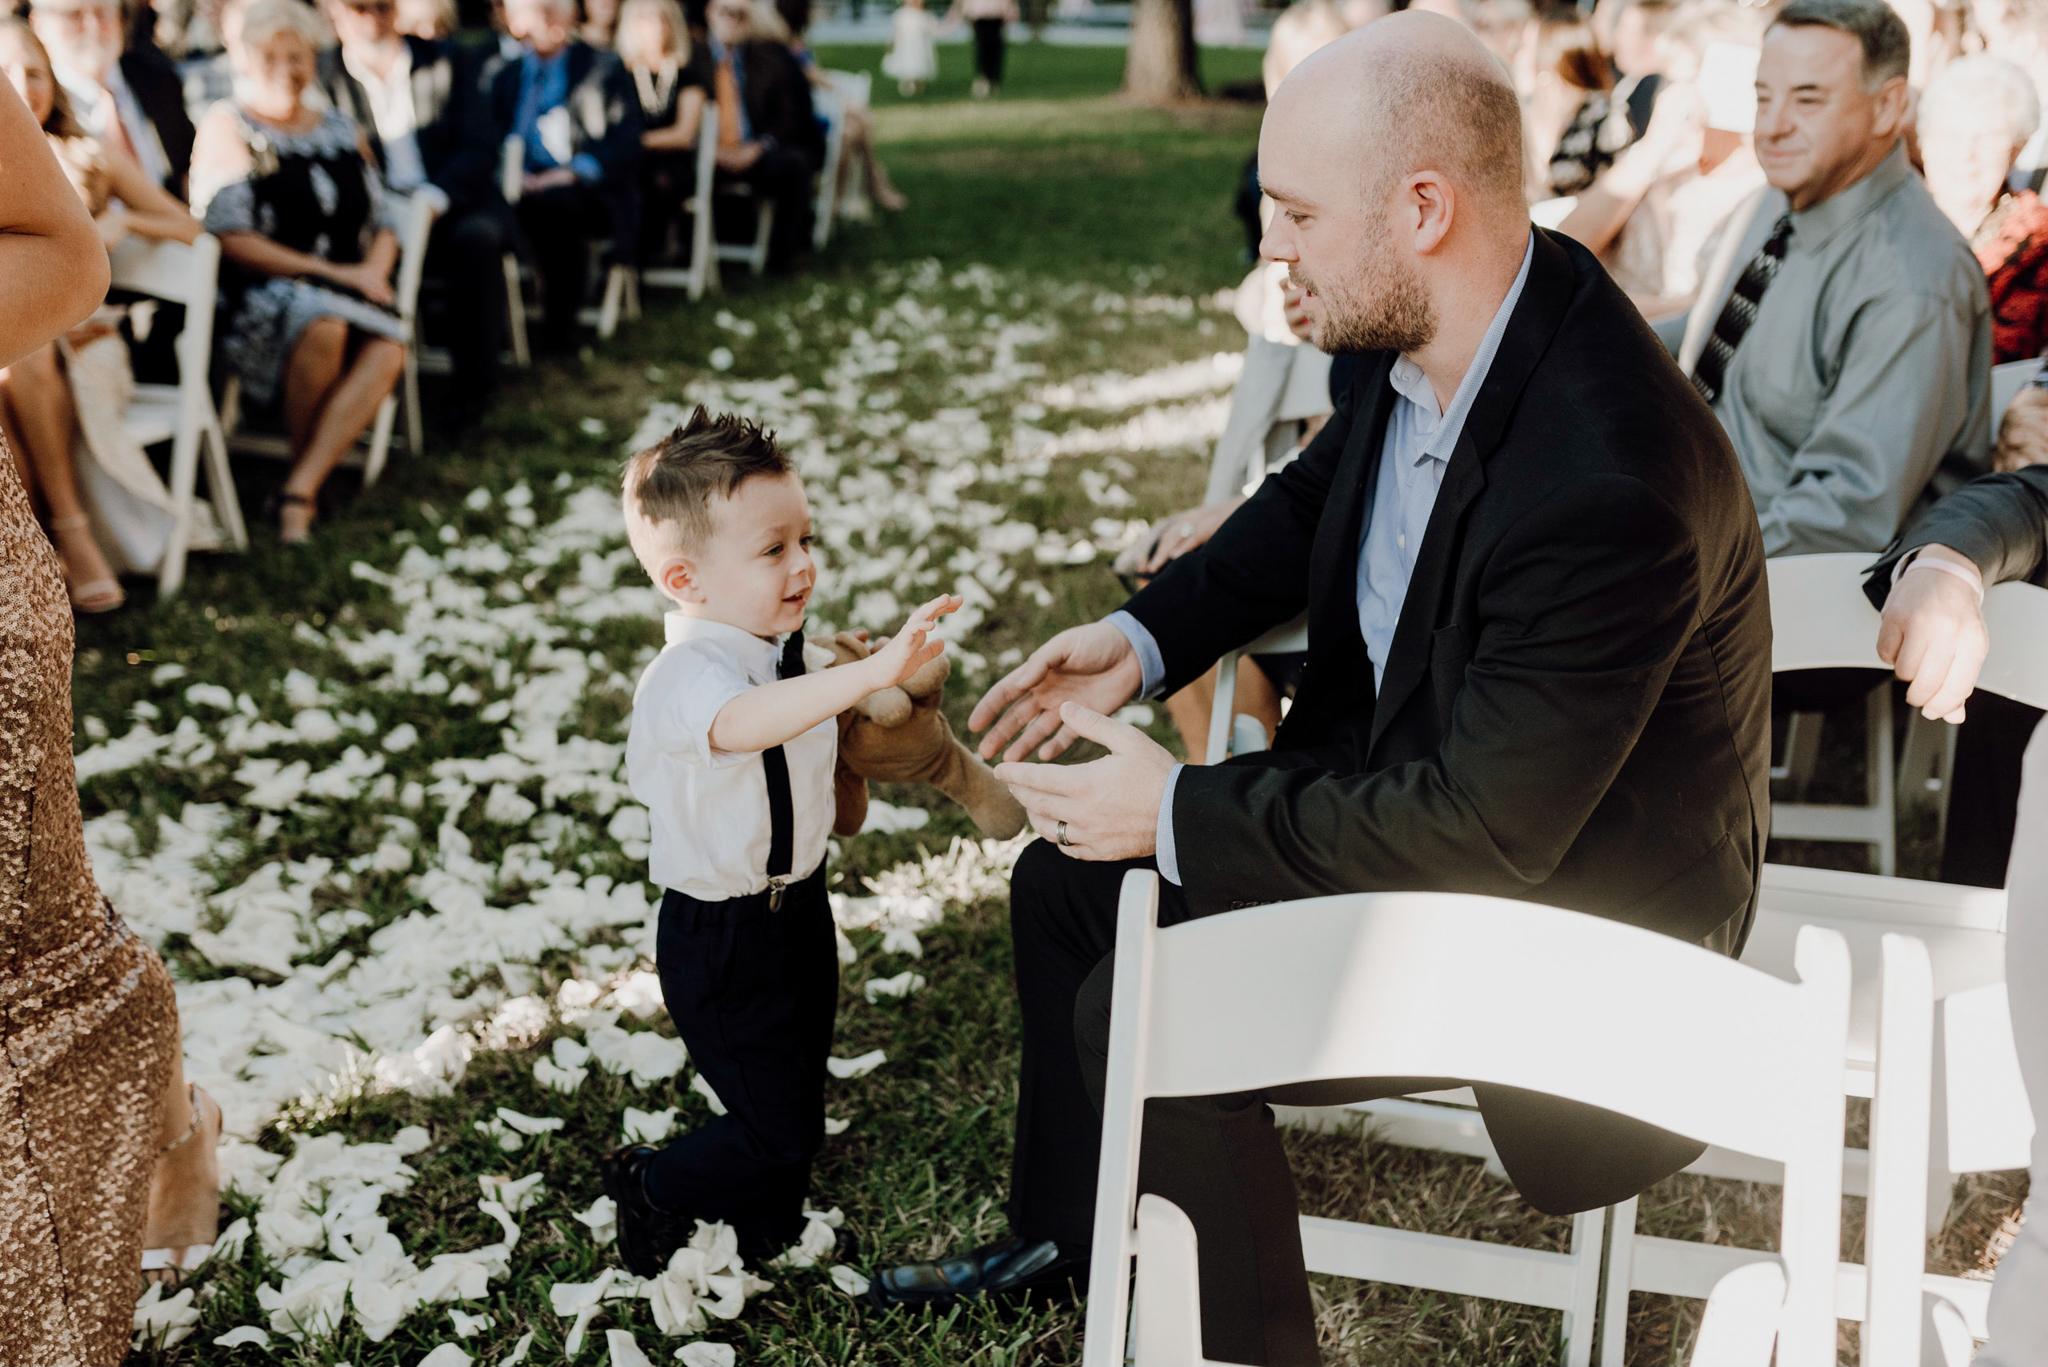 Houston Wedding Photographer-Intimate Texas Backyard Wedding- Houston Wedding Photographer -Kristen Giles Photography-35.jpg